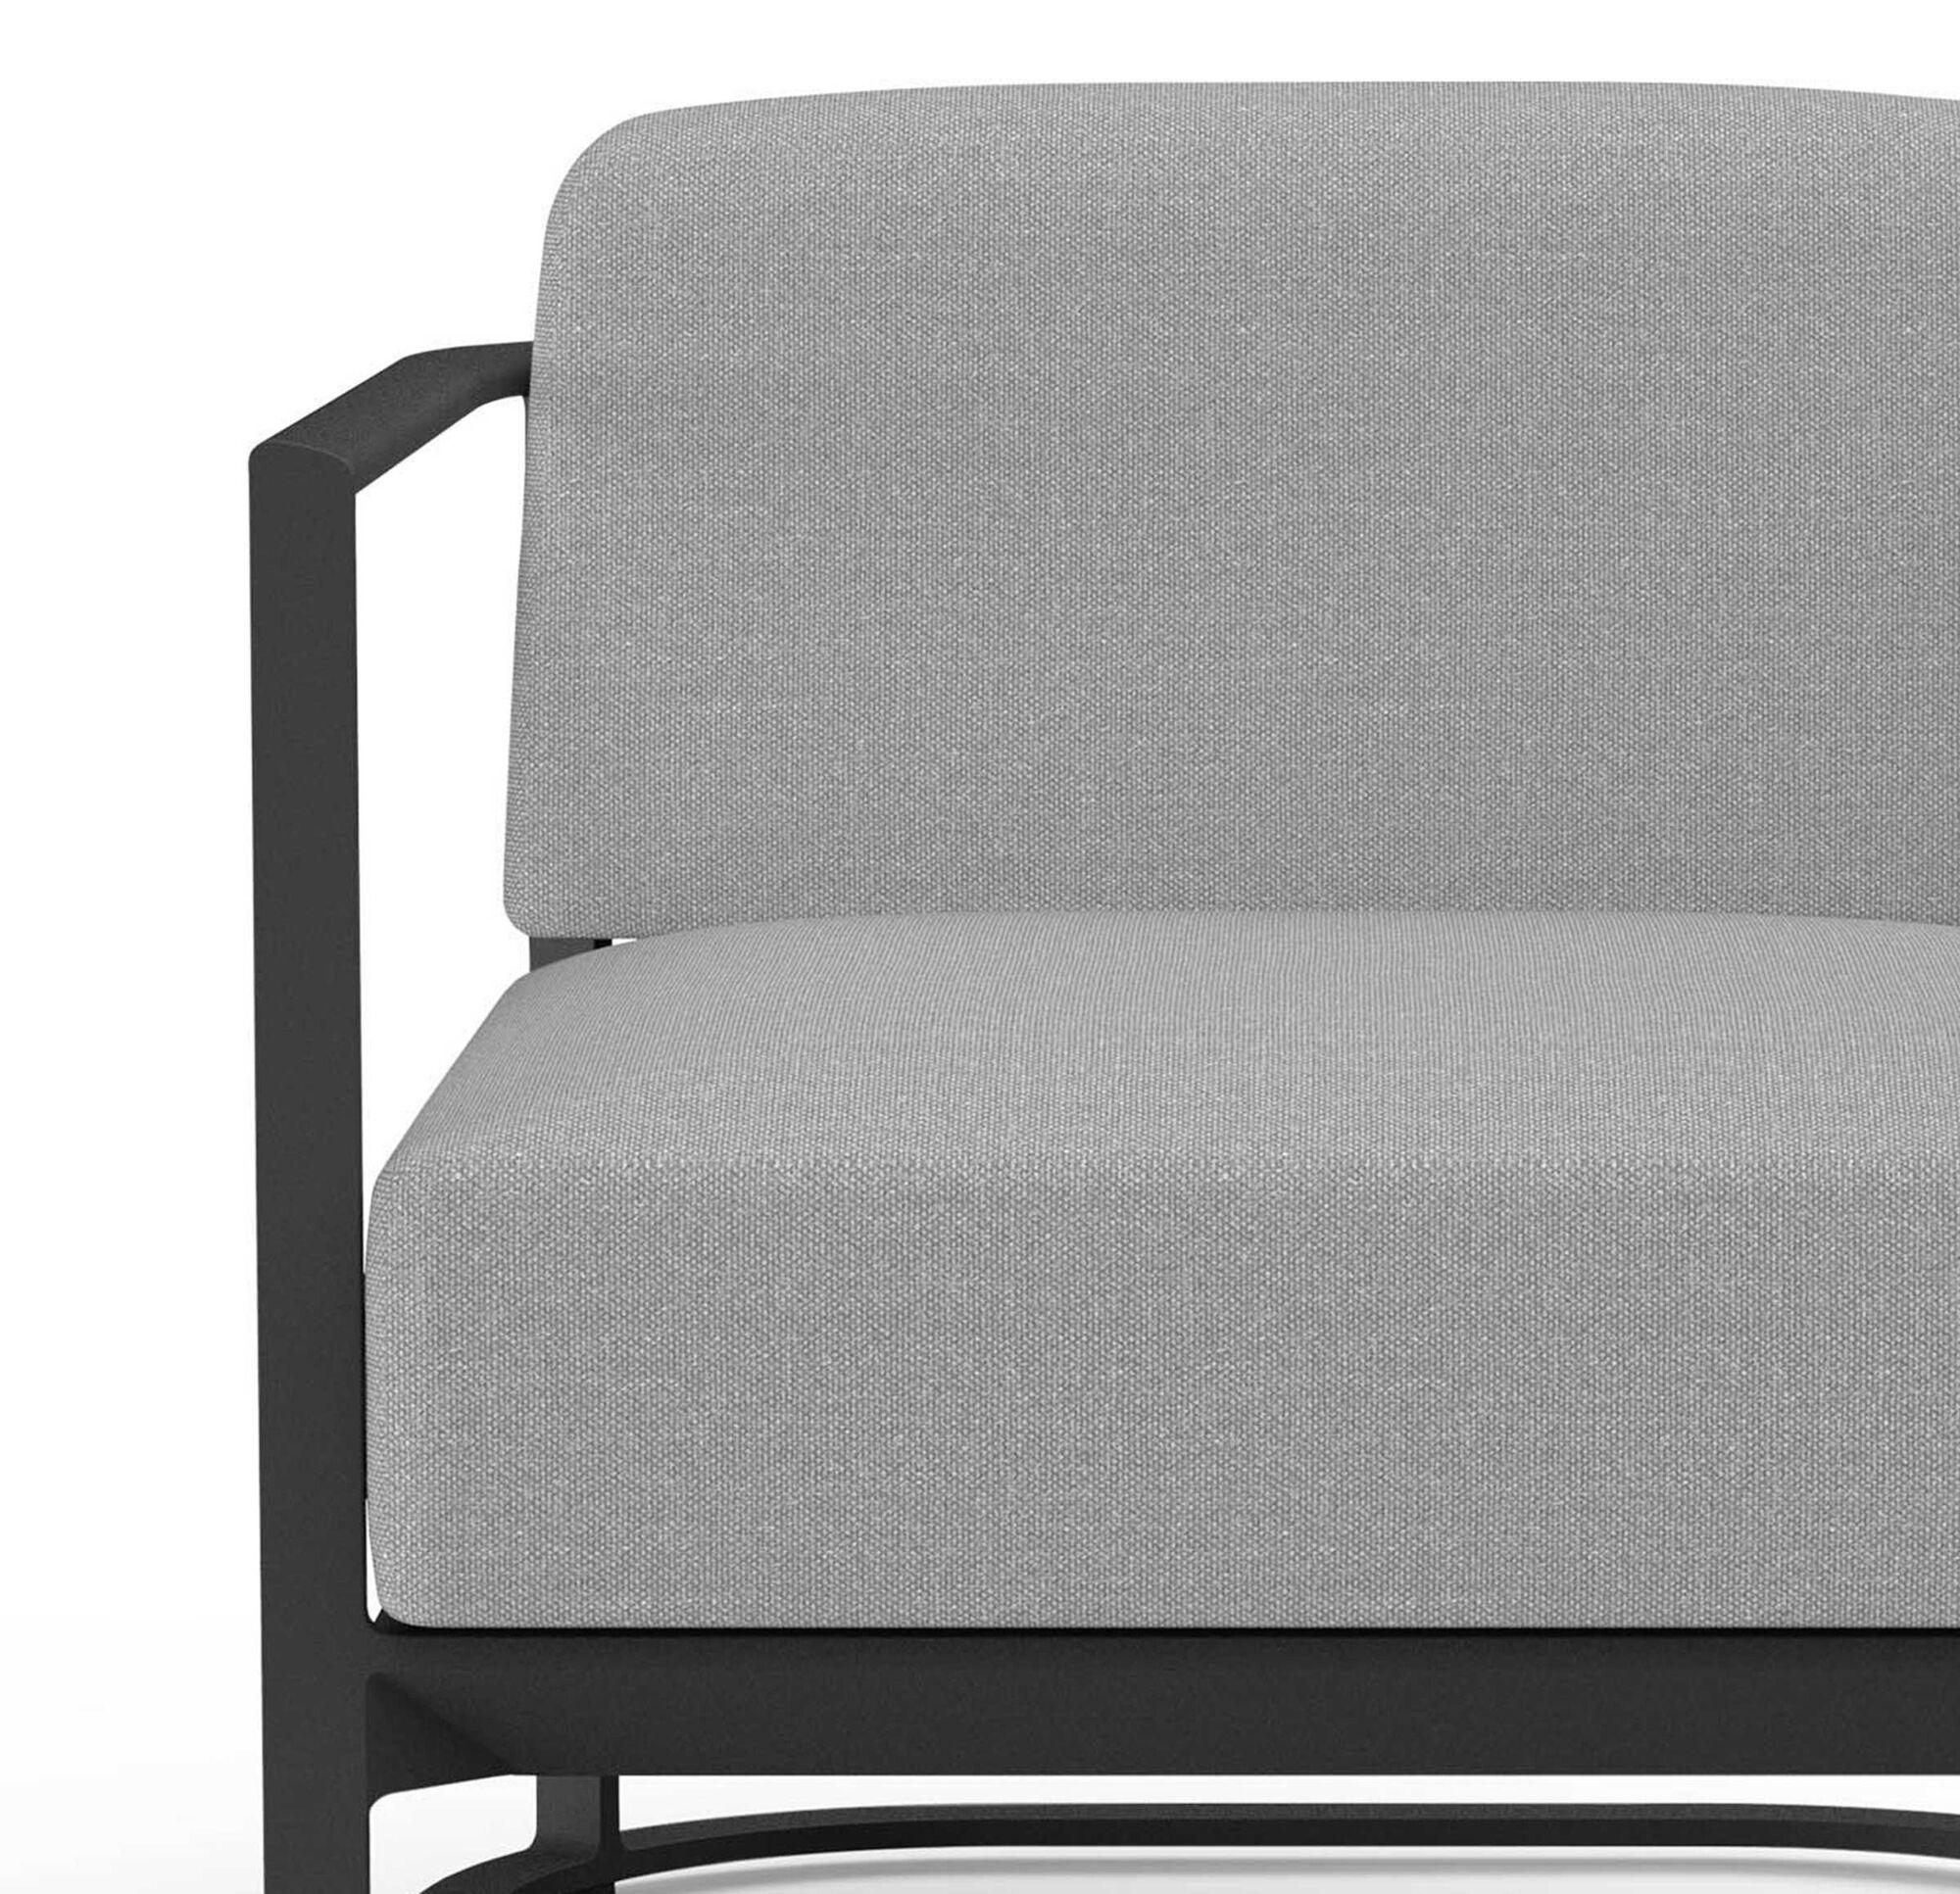 Sanibel Outdoor Lounge Chair Cushion, White Outdoor Lounge Chair Cushions